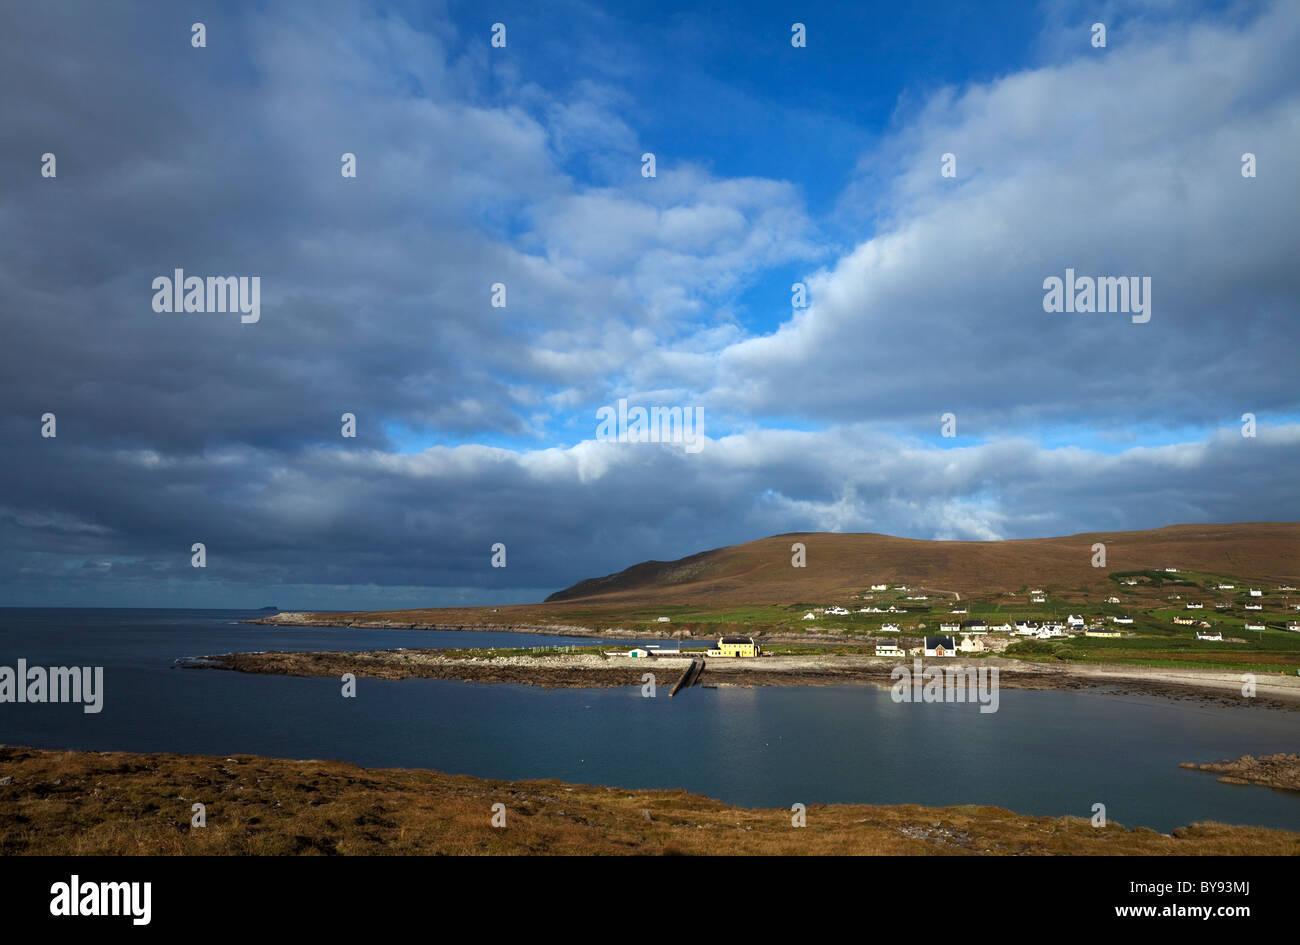 Dooega Village on the Atlantic Drive, Achill Island, County Mayo, Ireland - Stock Image